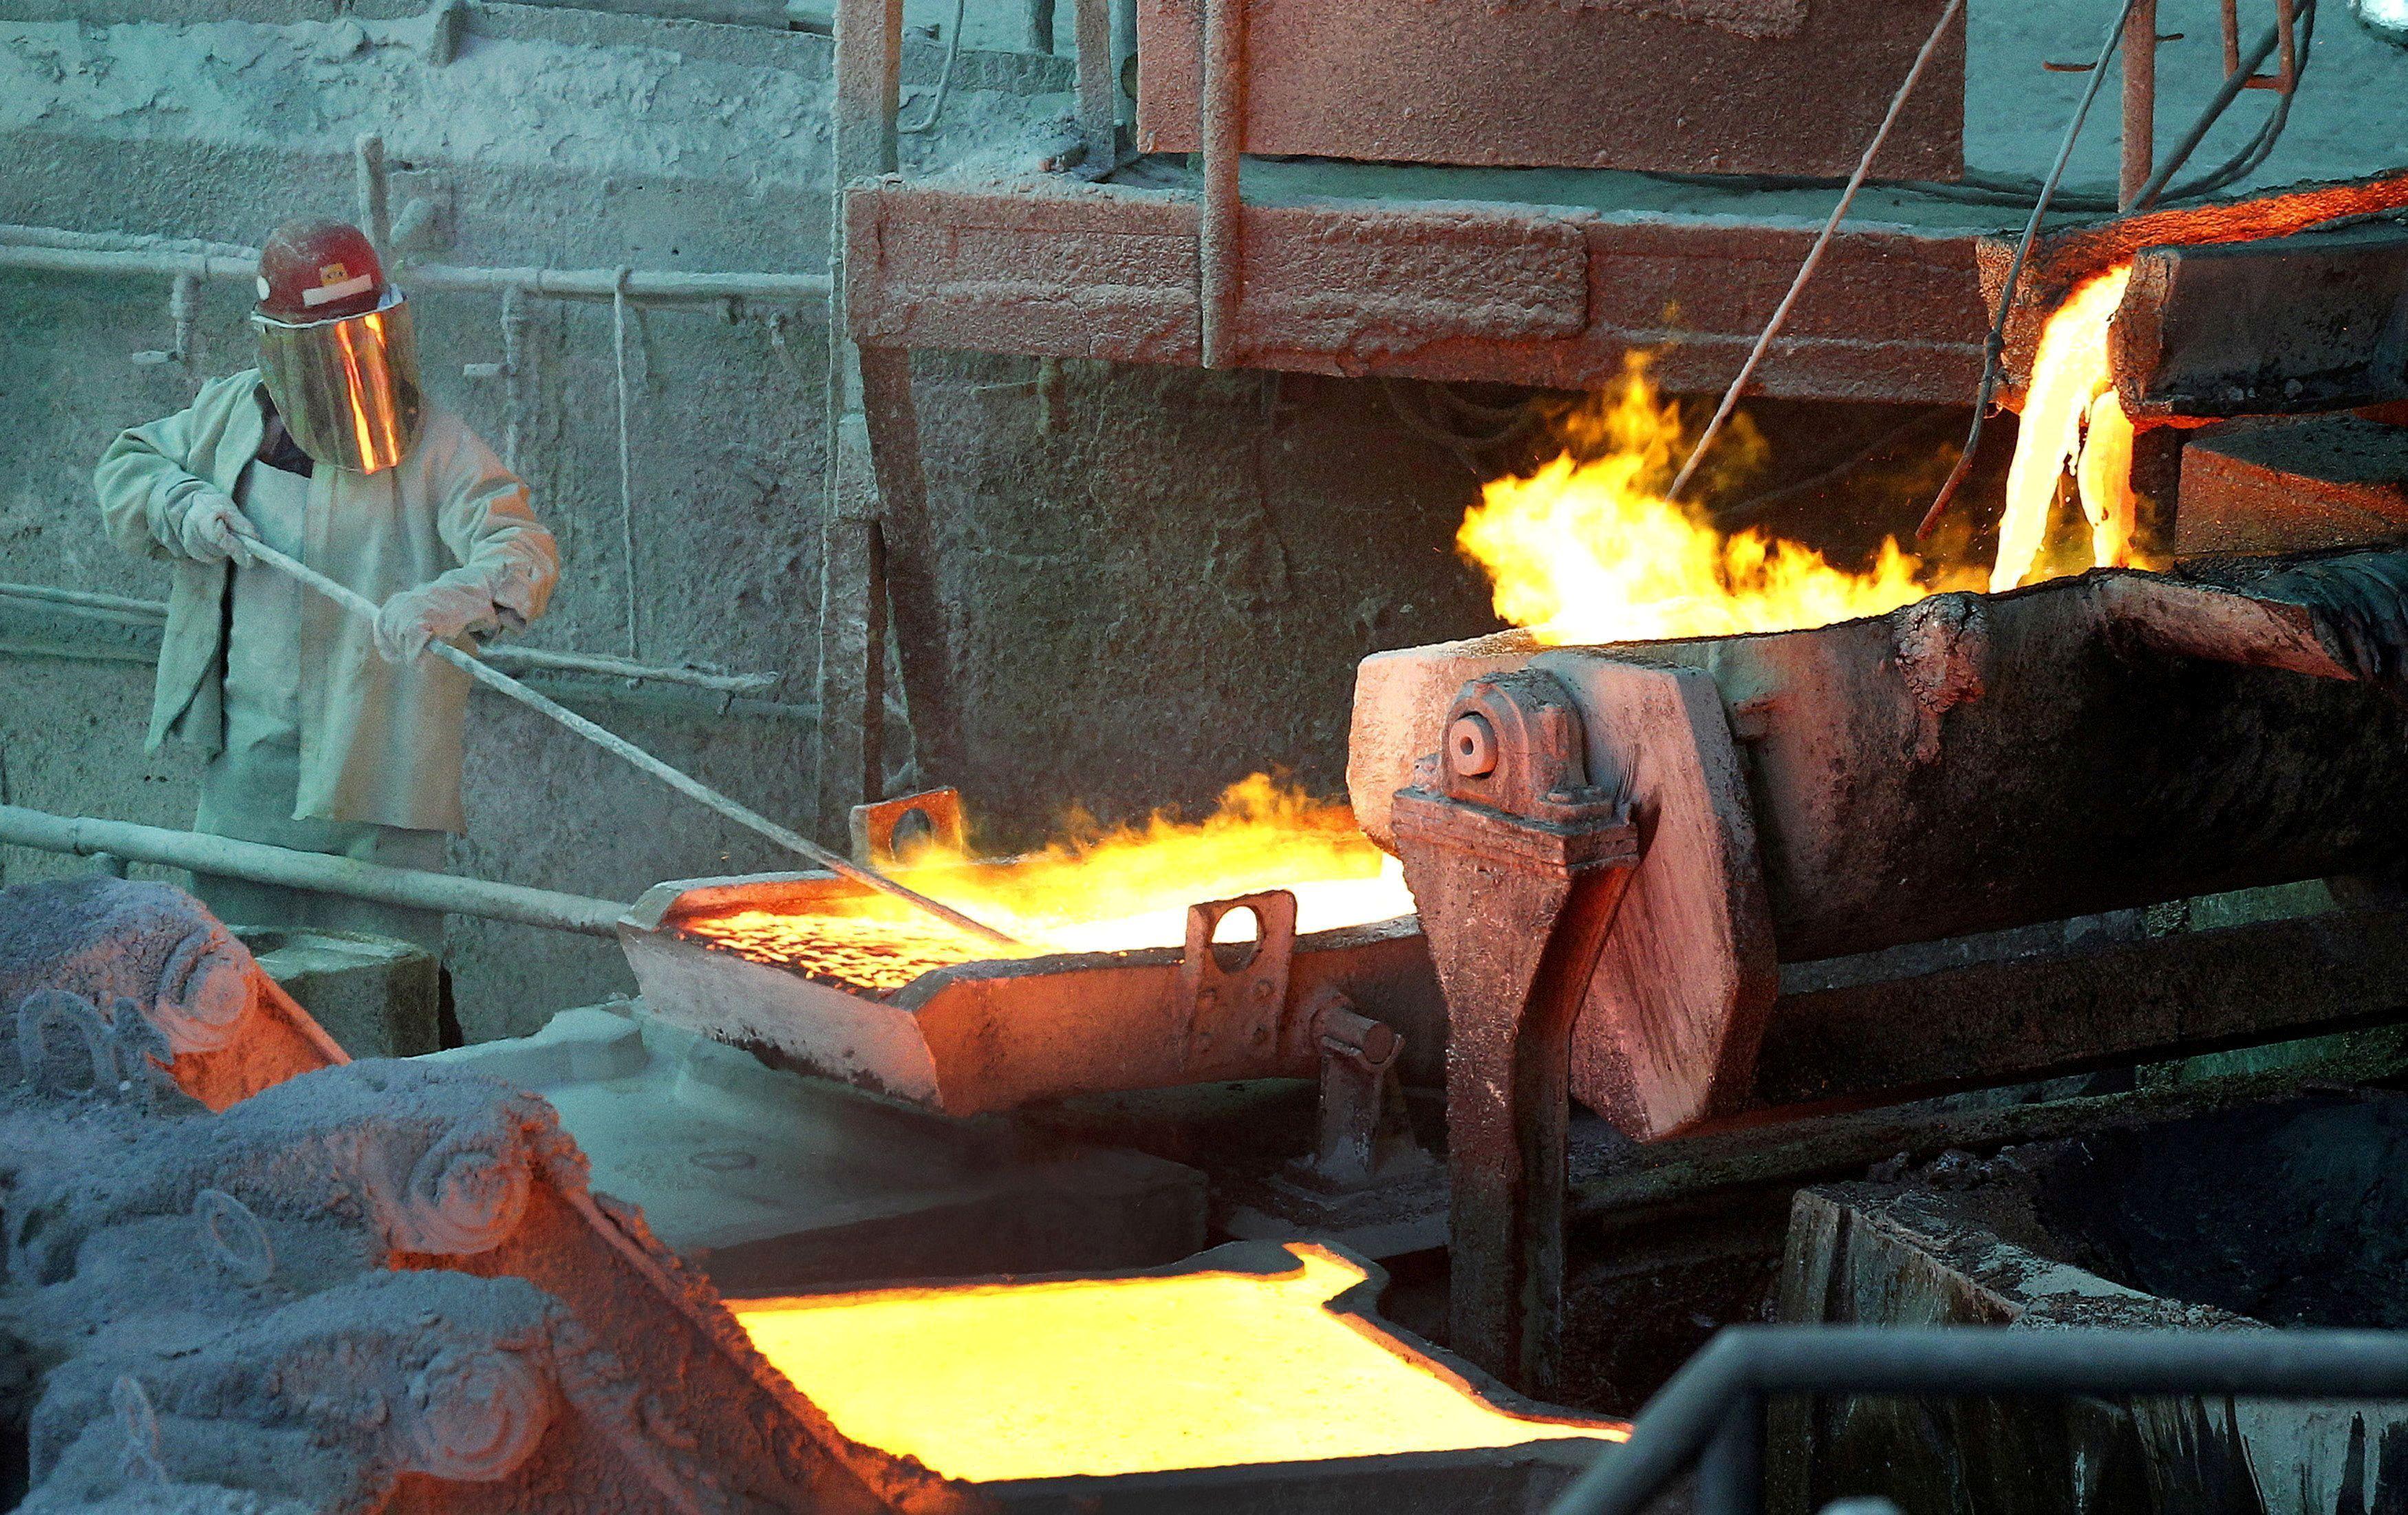 A worker monitors a process at the Codelco Ventanas copper smelter in Ventanas, Chile, January 7, 2015. REUTERS/Rodrigo Garrido